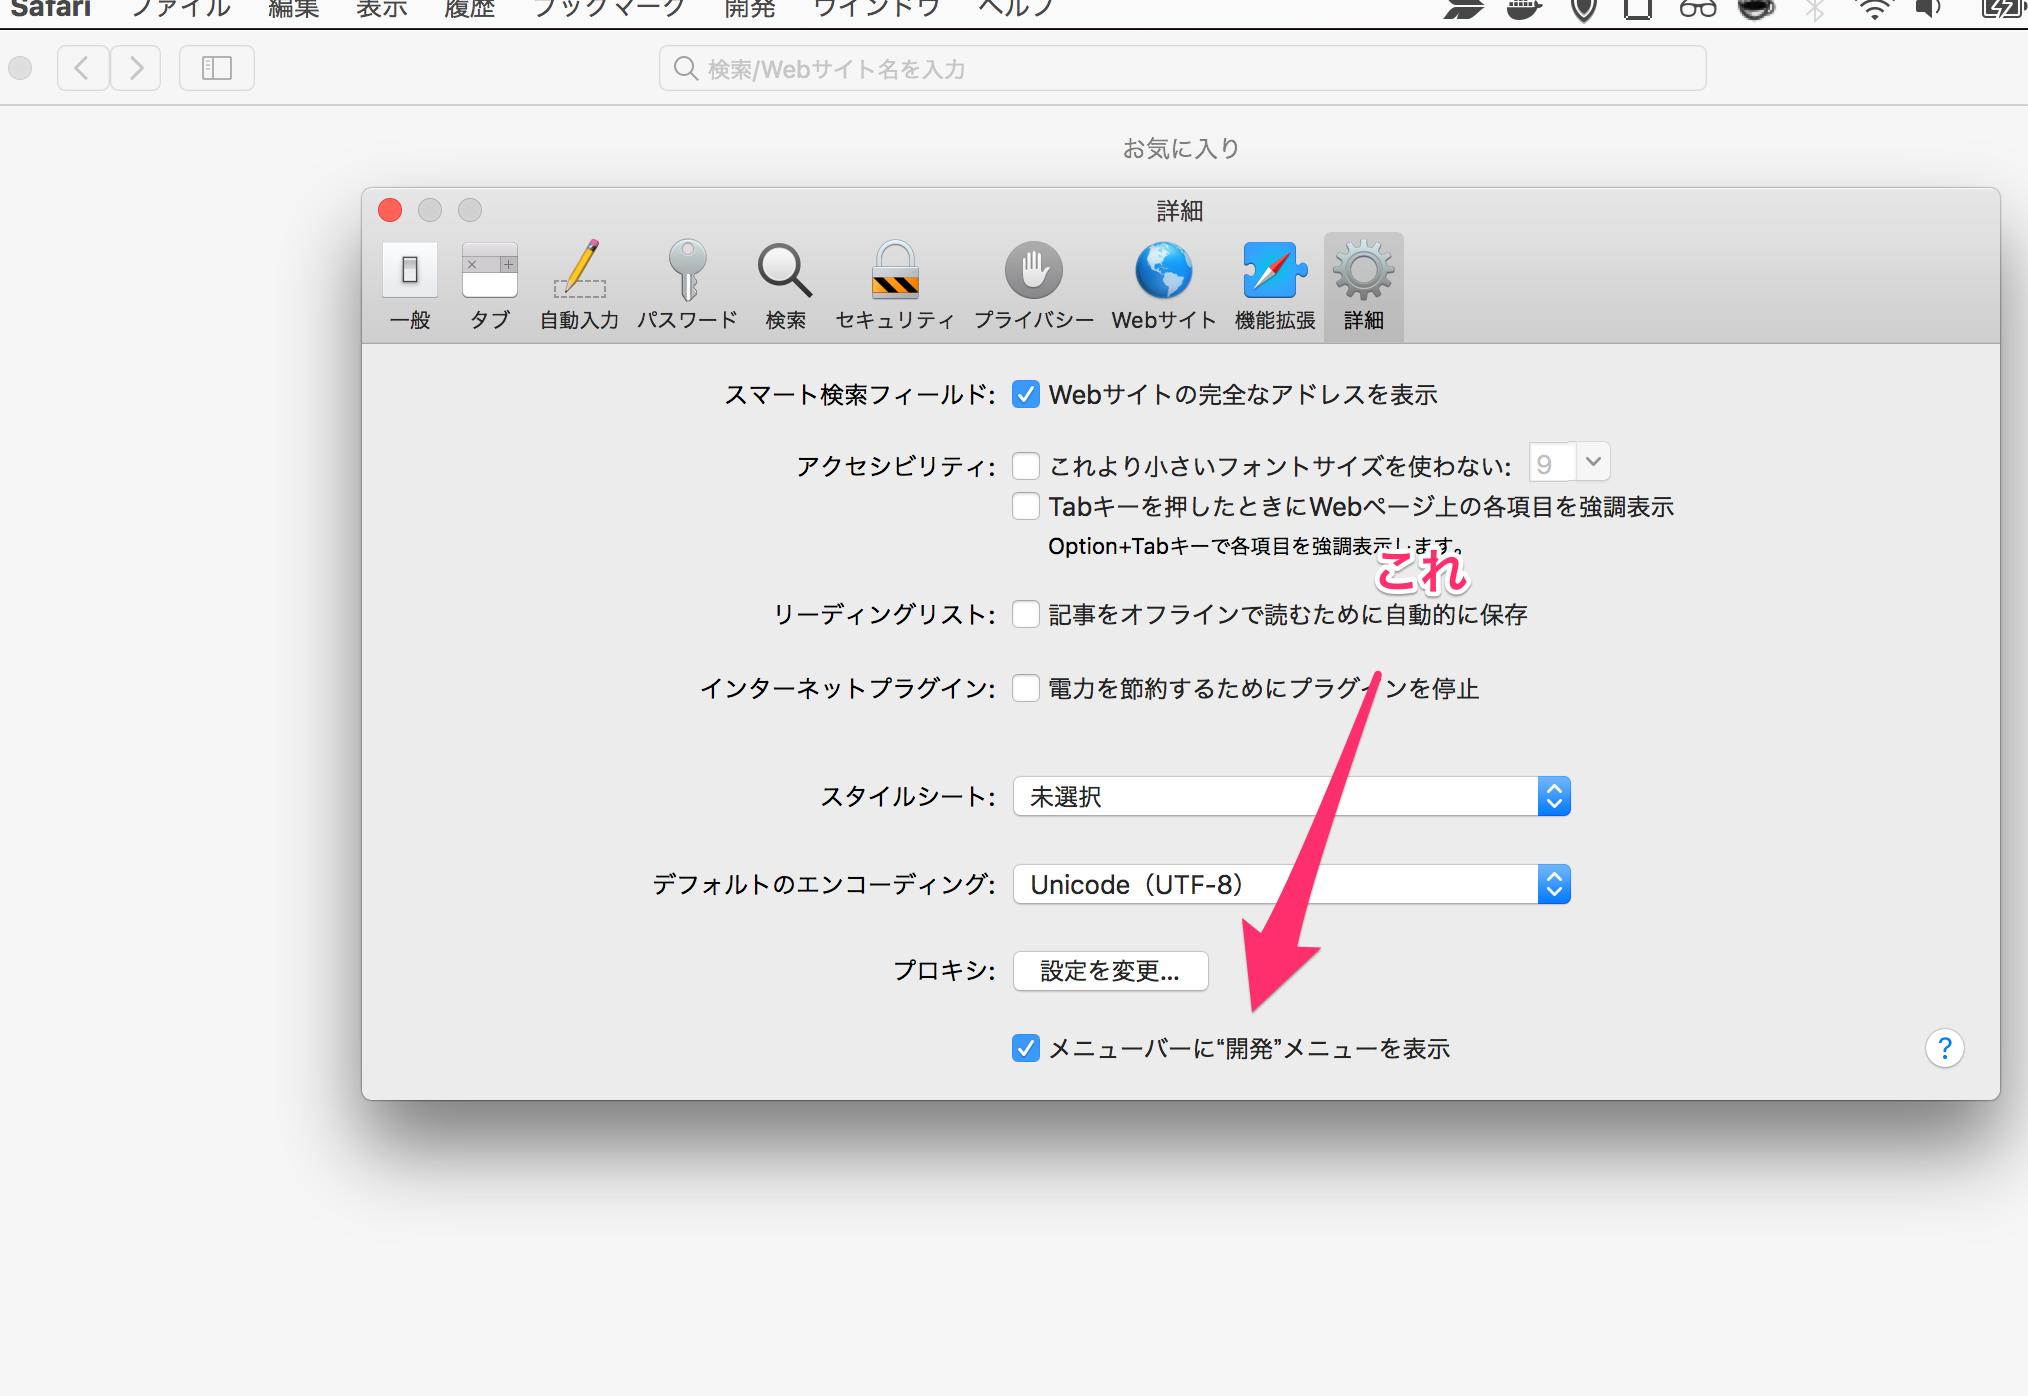 Safari 開発メニューを表示